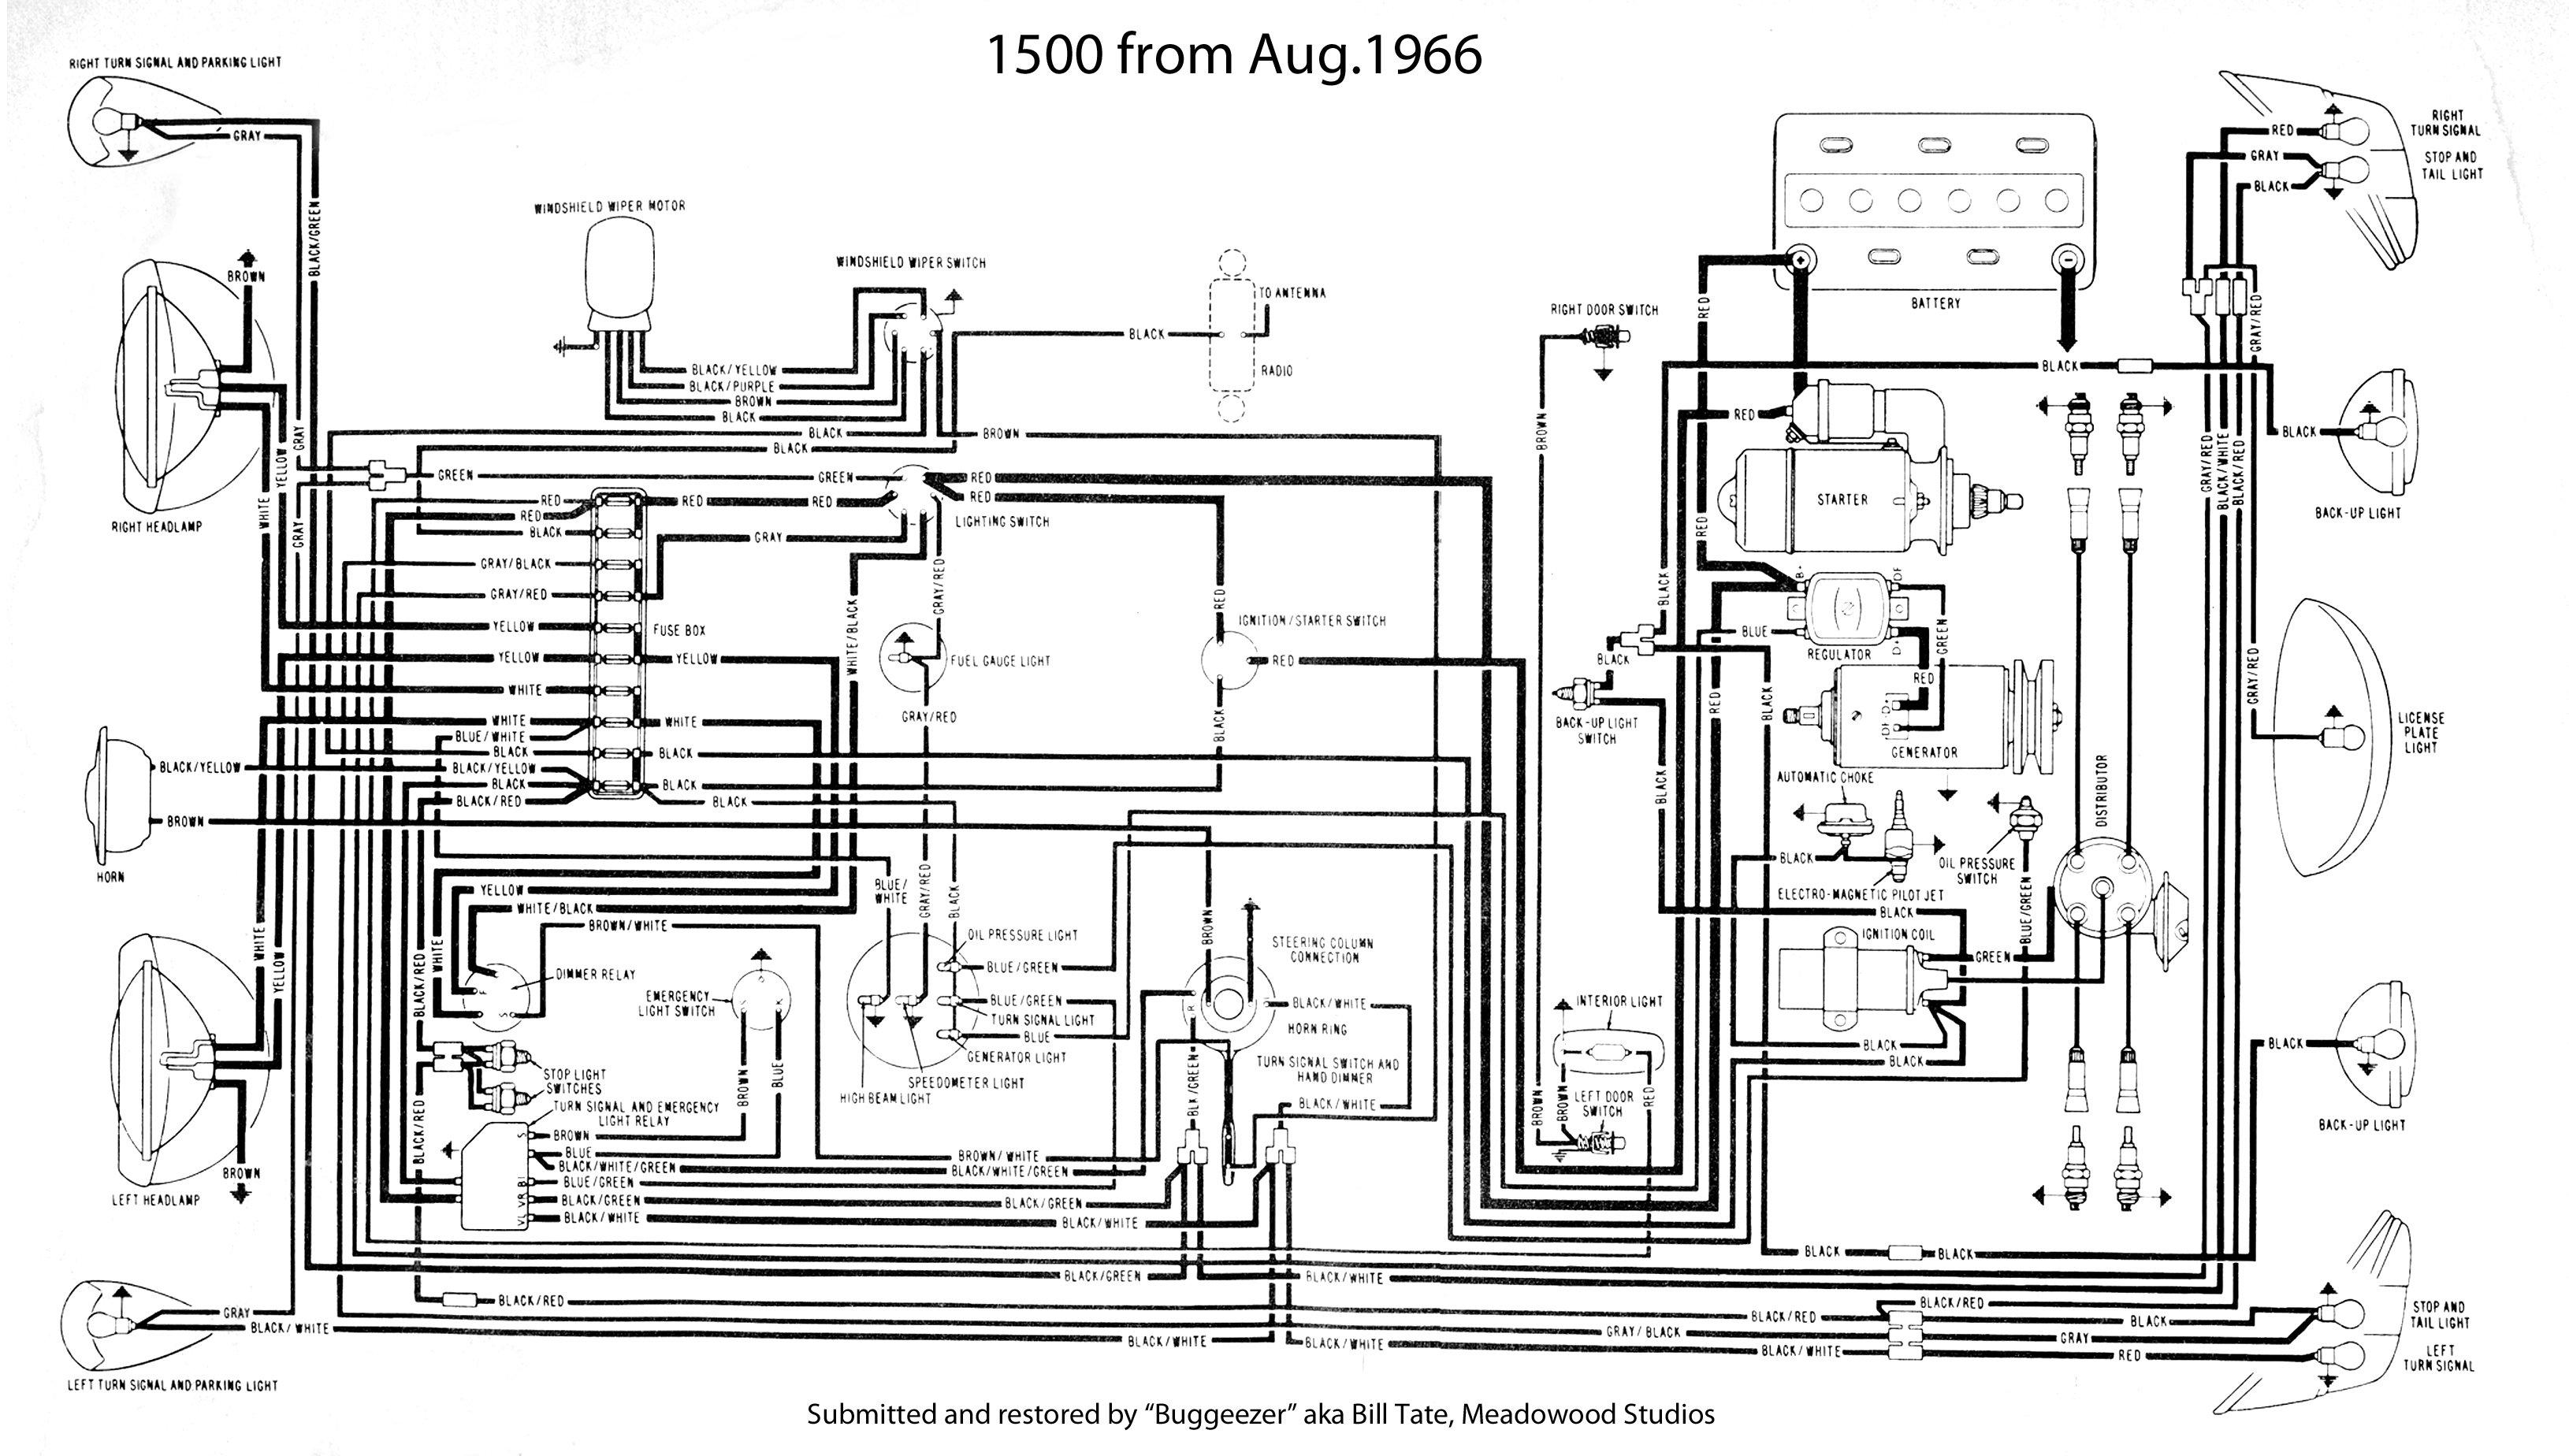 vw coil wiring diagram universal turing machine air cooled distributor free engine image